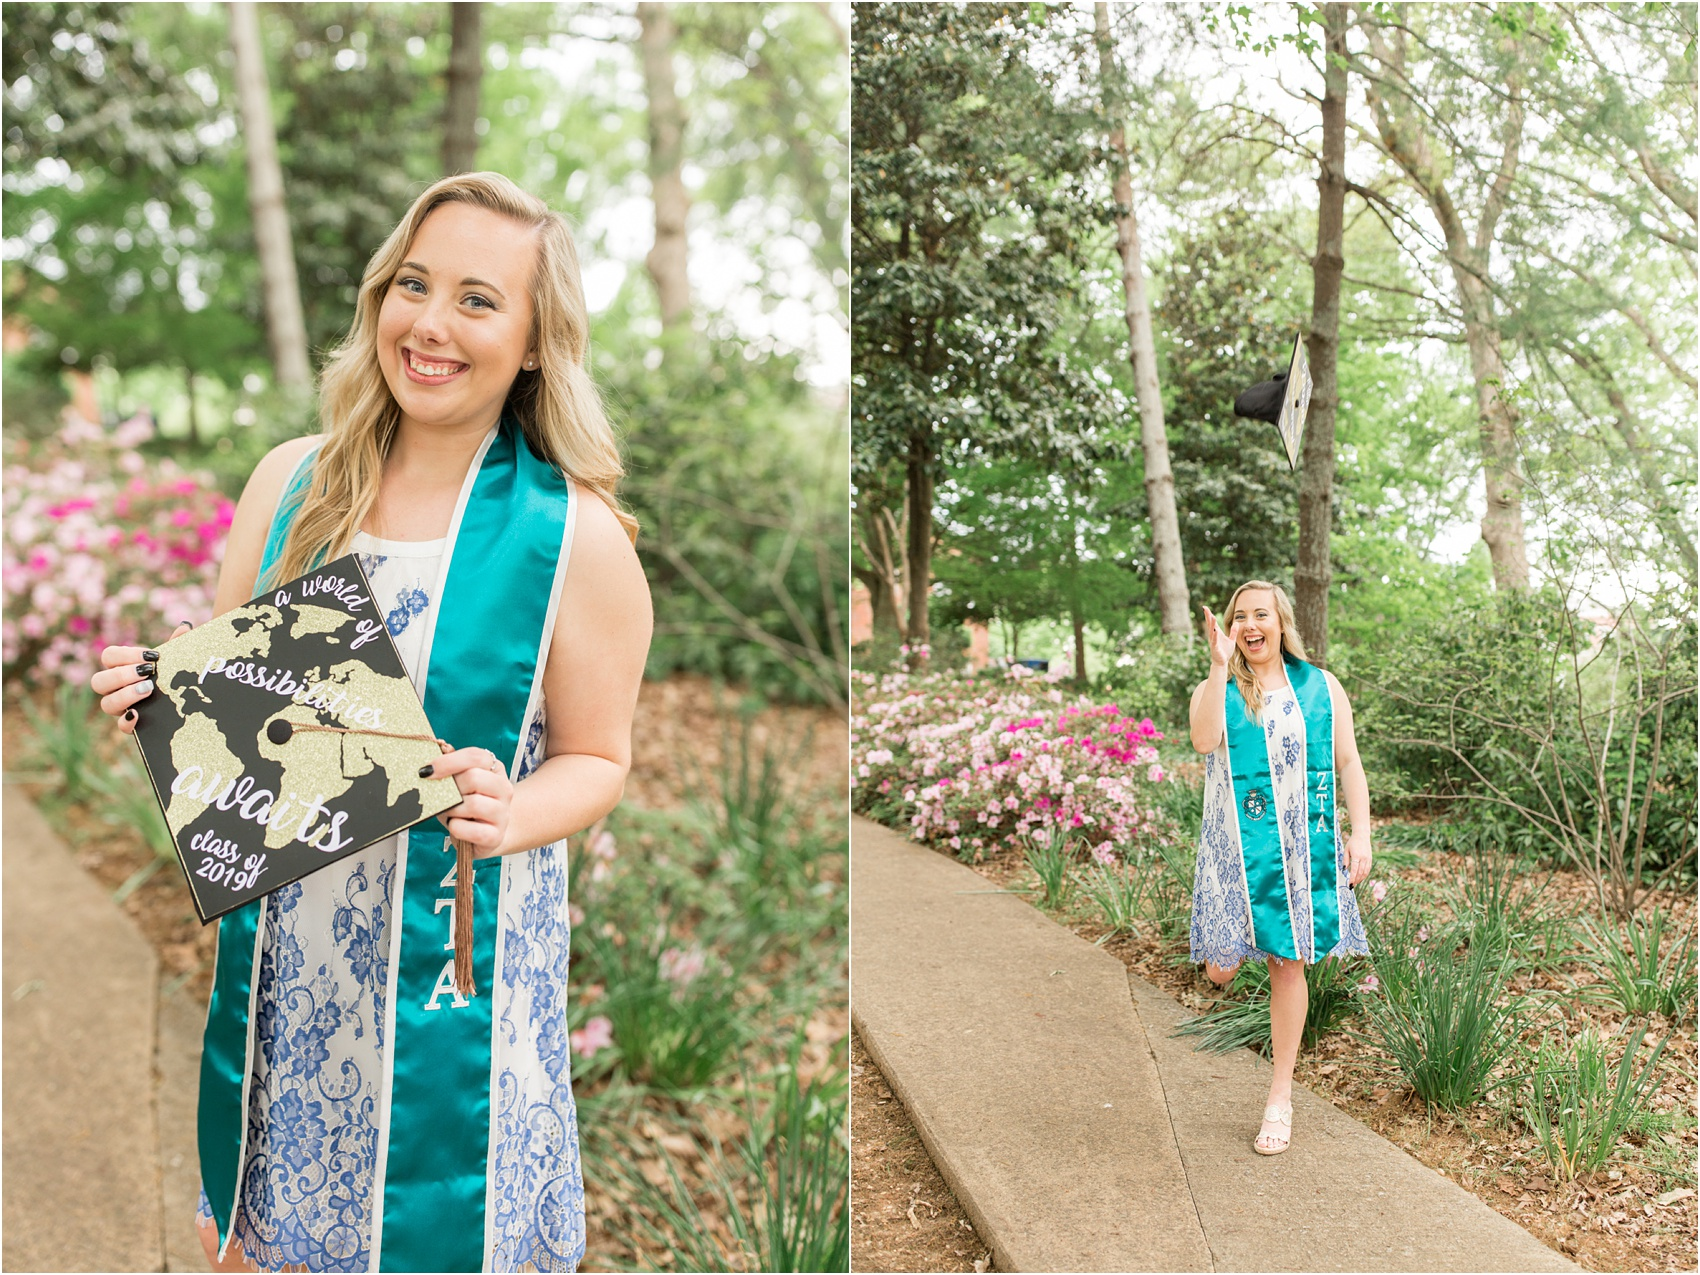 Savannah Eve Photography- Avery Miller's Grad Pics-15.jpg